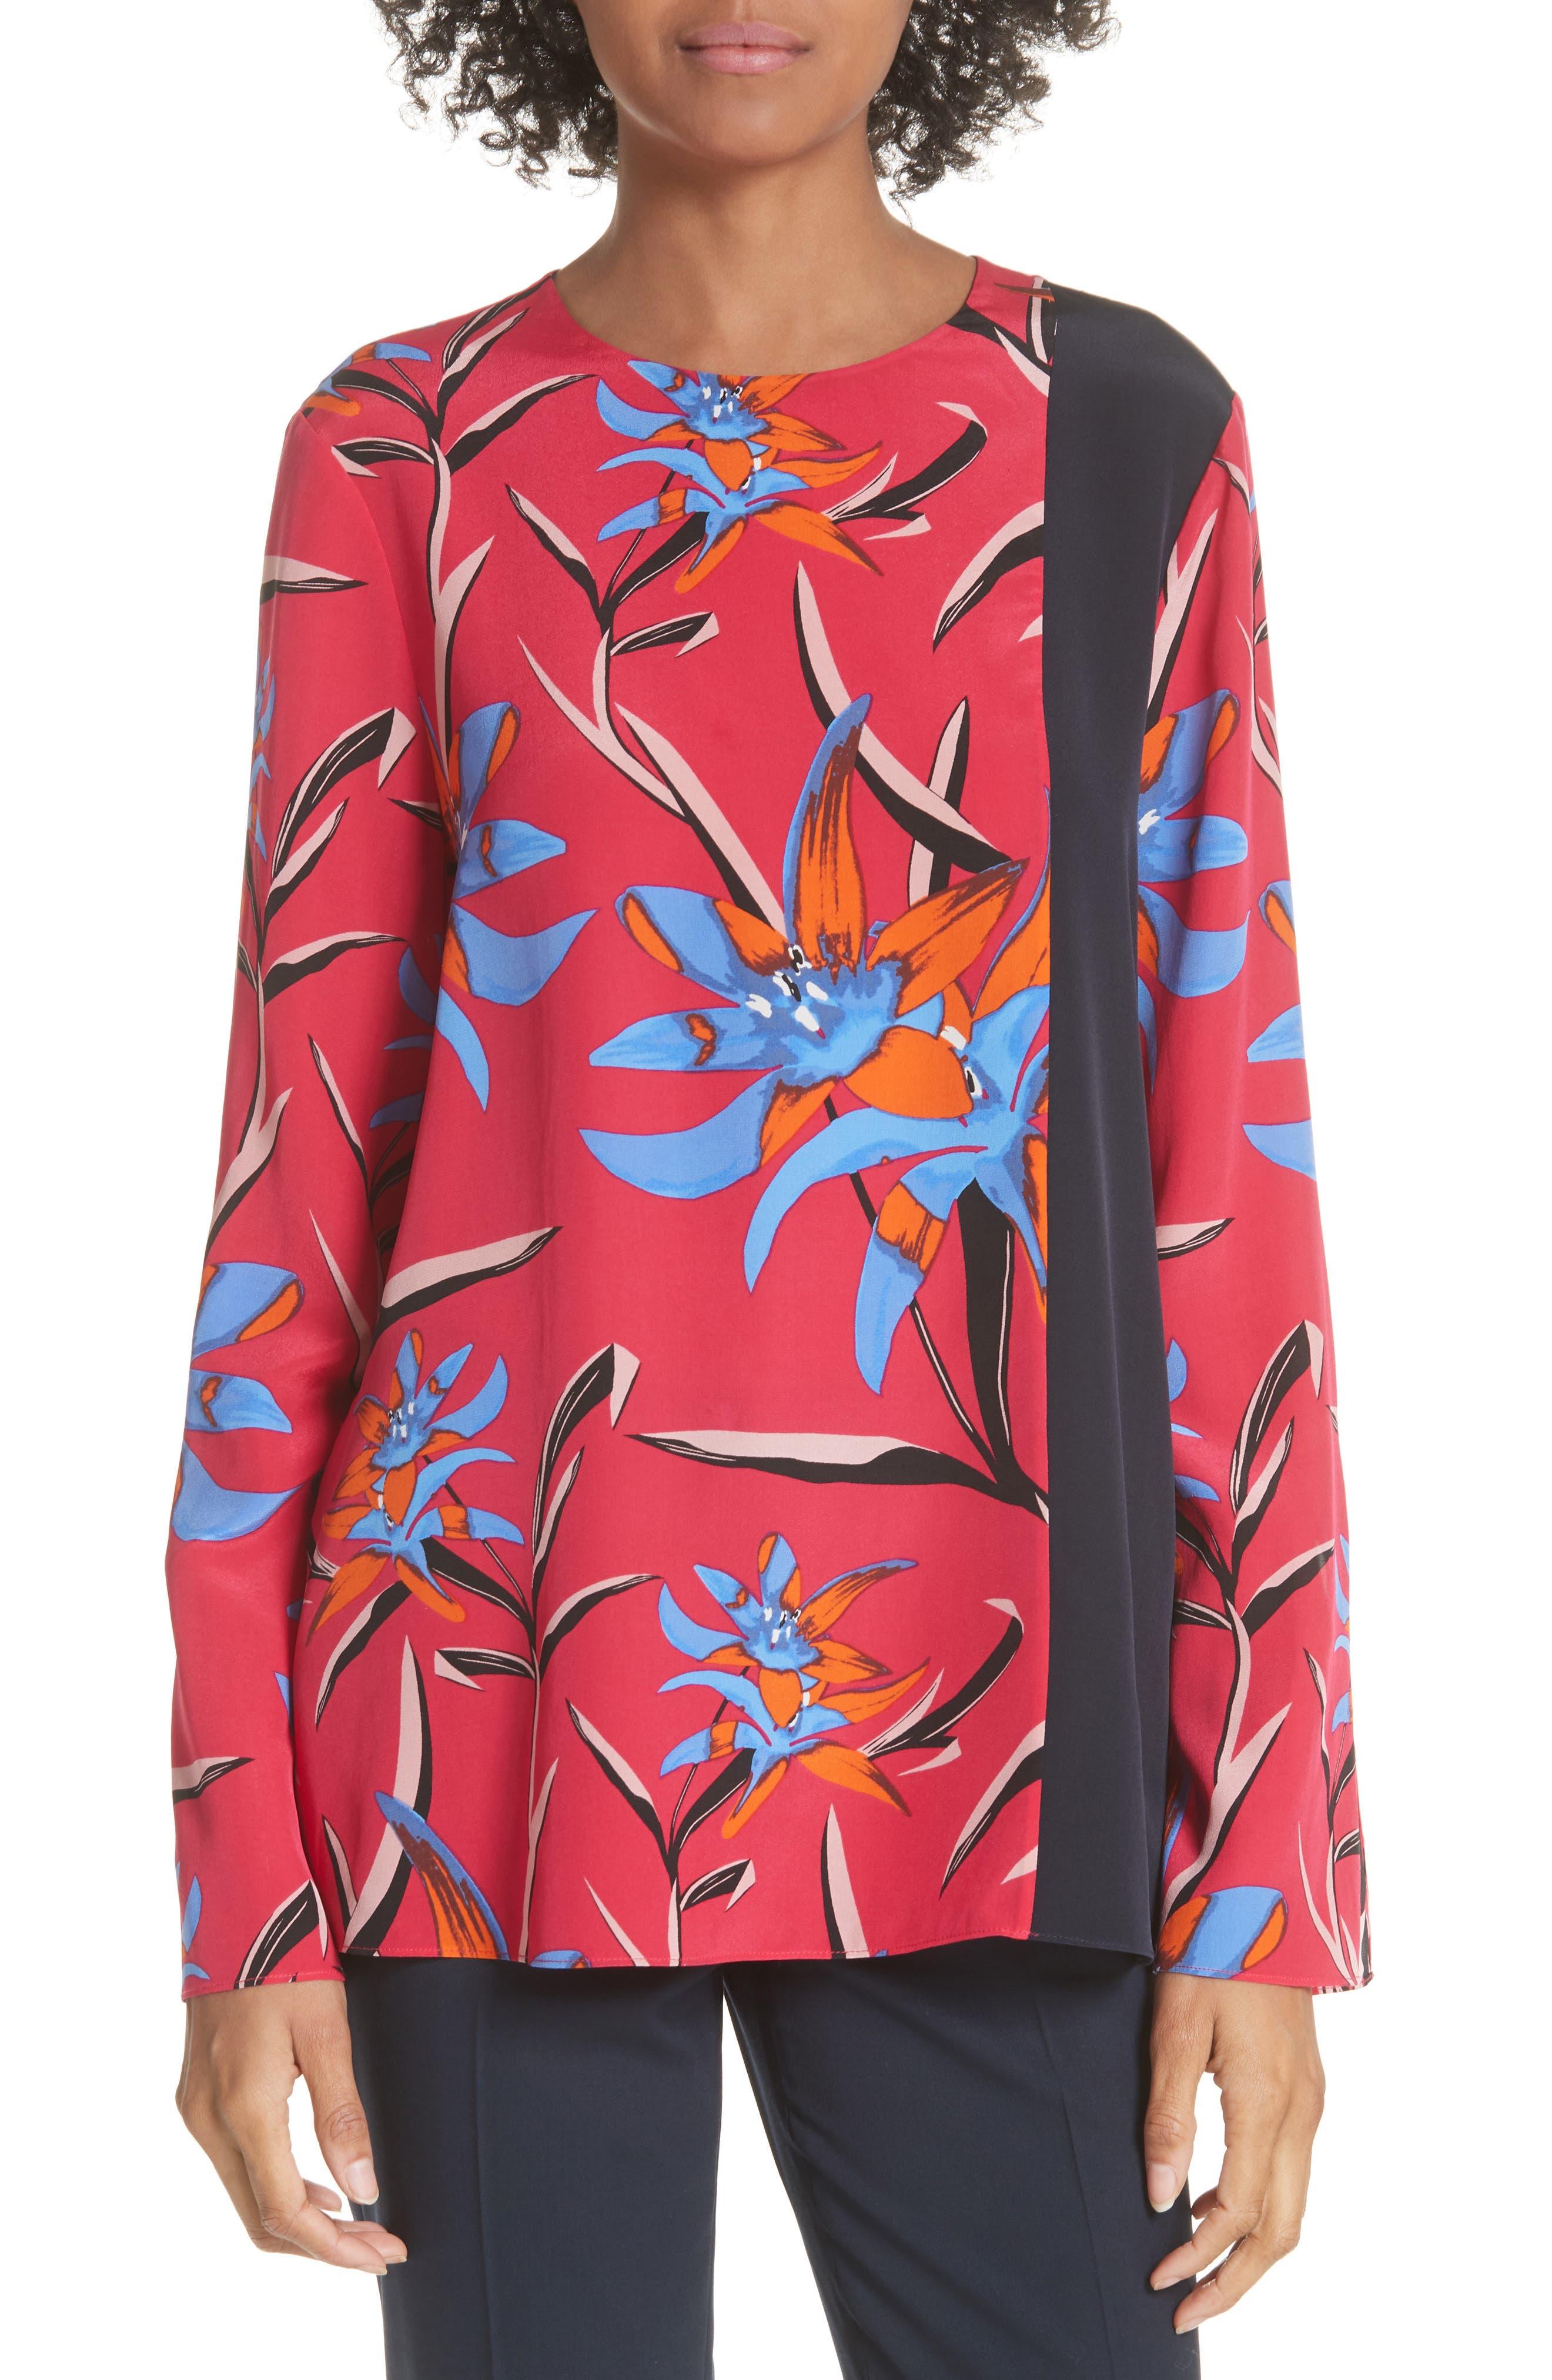 Diane von Furstenberg Side Slit Silk Blouse,                             Main thumbnail 1, color,                             Harlow Magenta/Alexander Navy